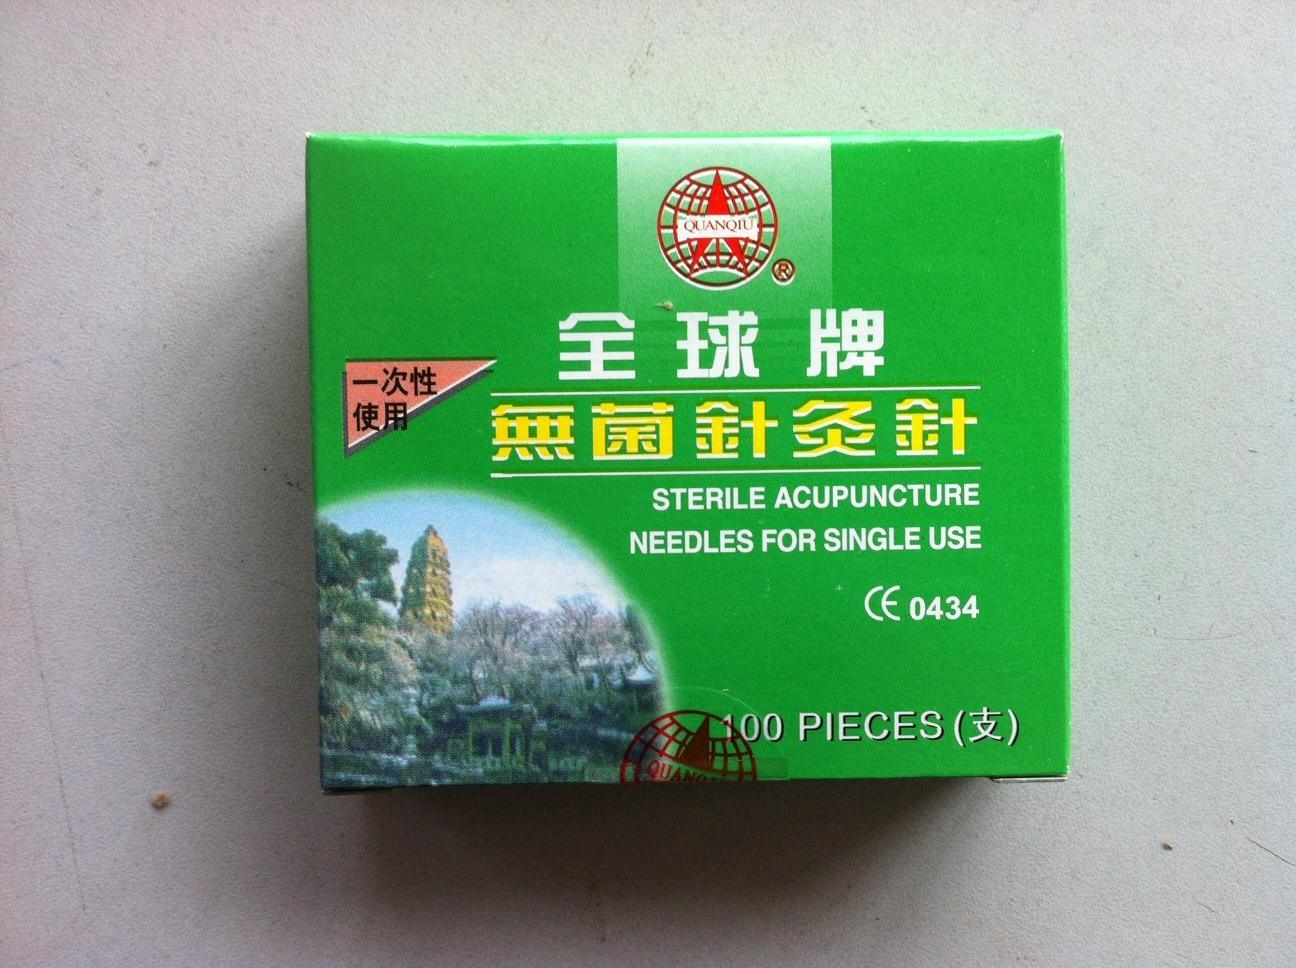 Quan Qiu Brand Disposal Acupuncture Needles